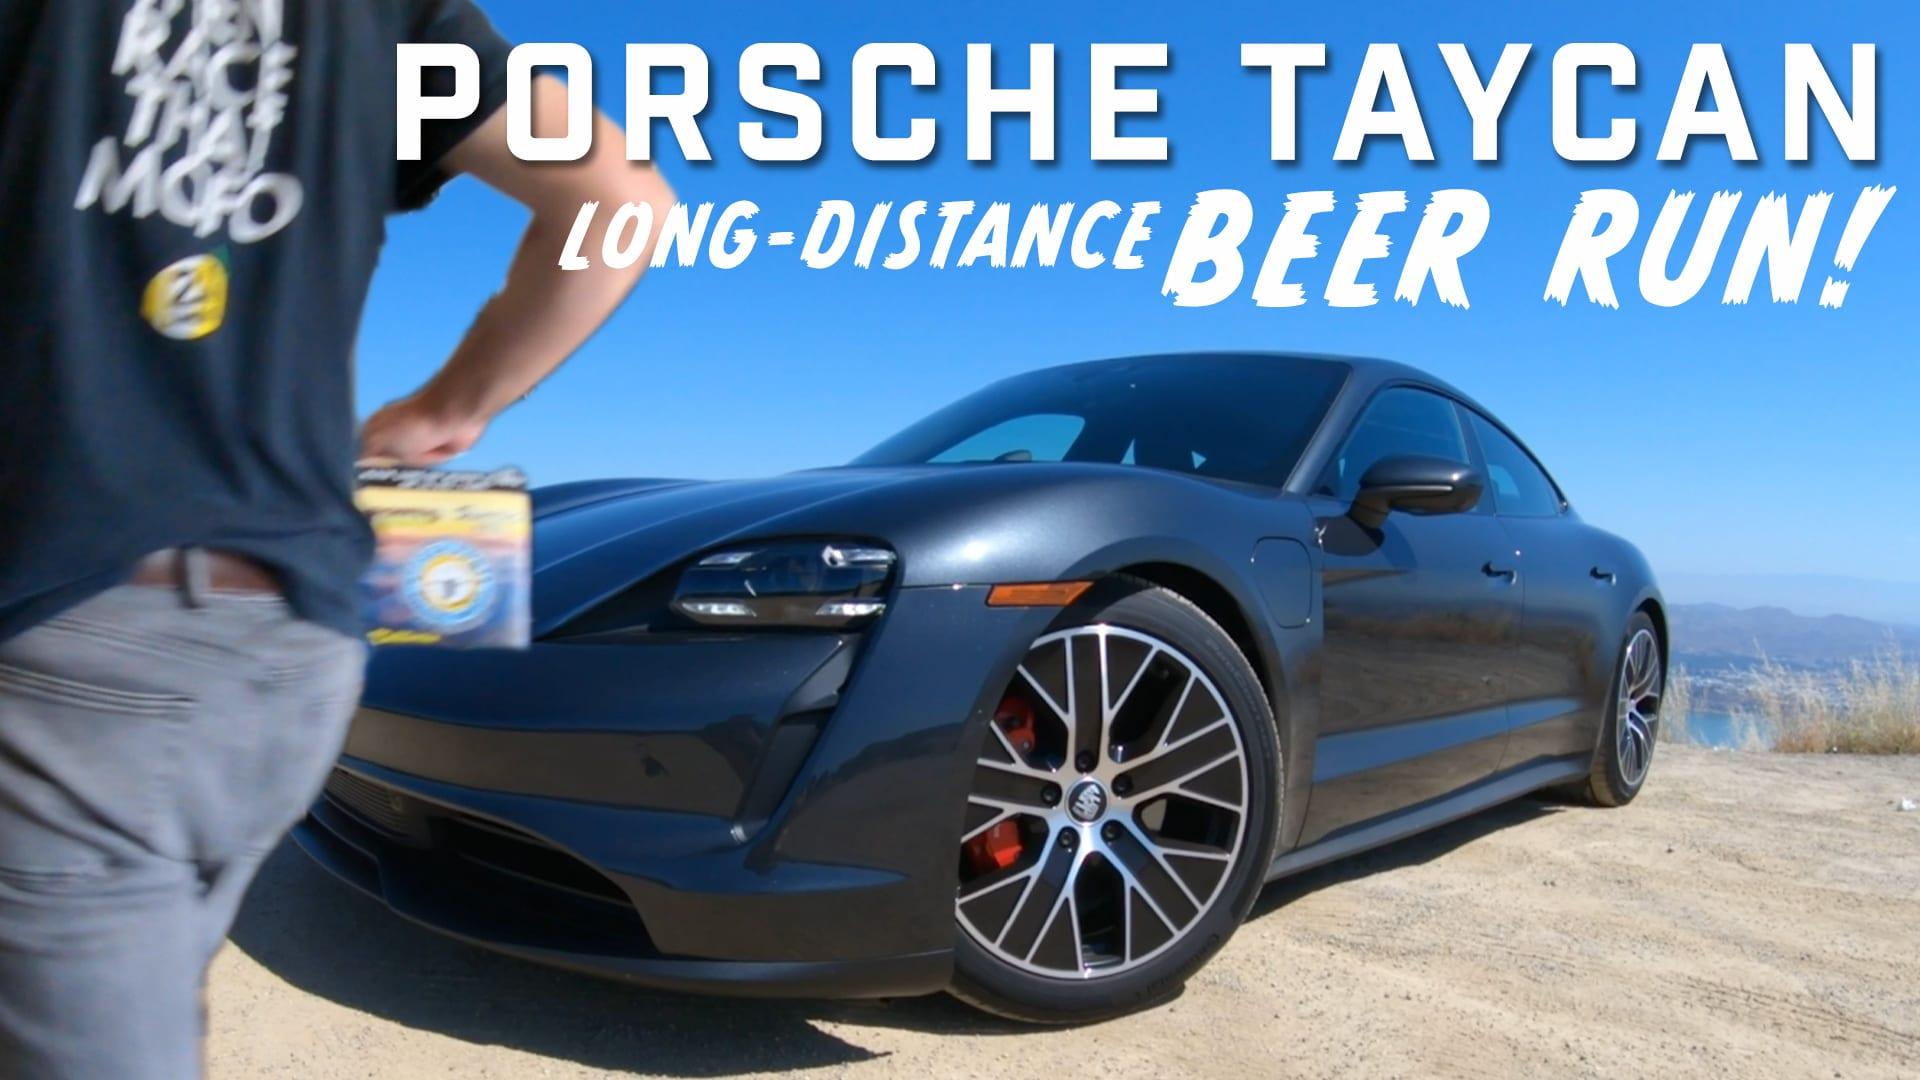 Porsche Taycan 4S beer run